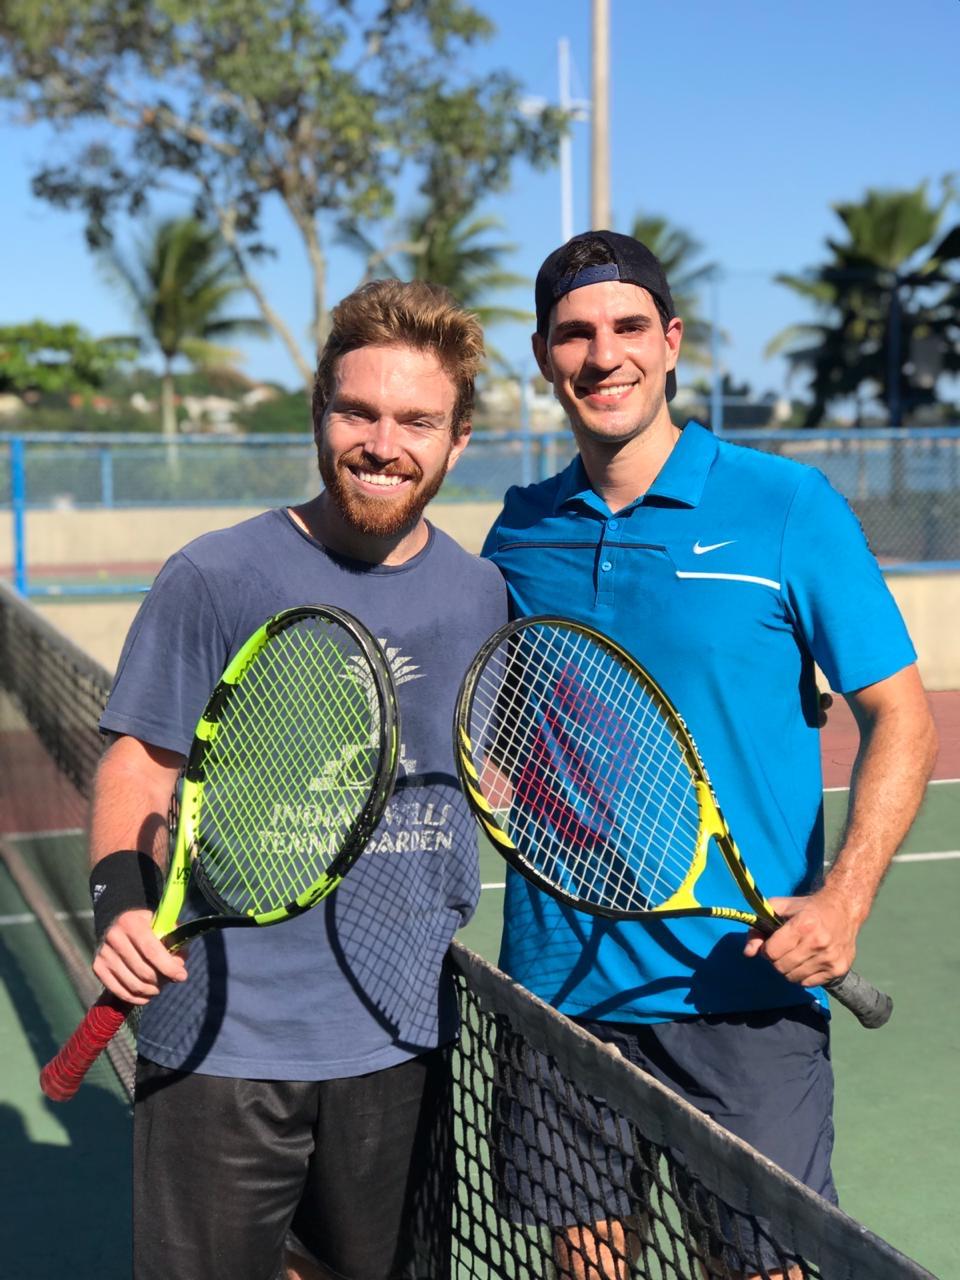 two men posing with tennis paddles